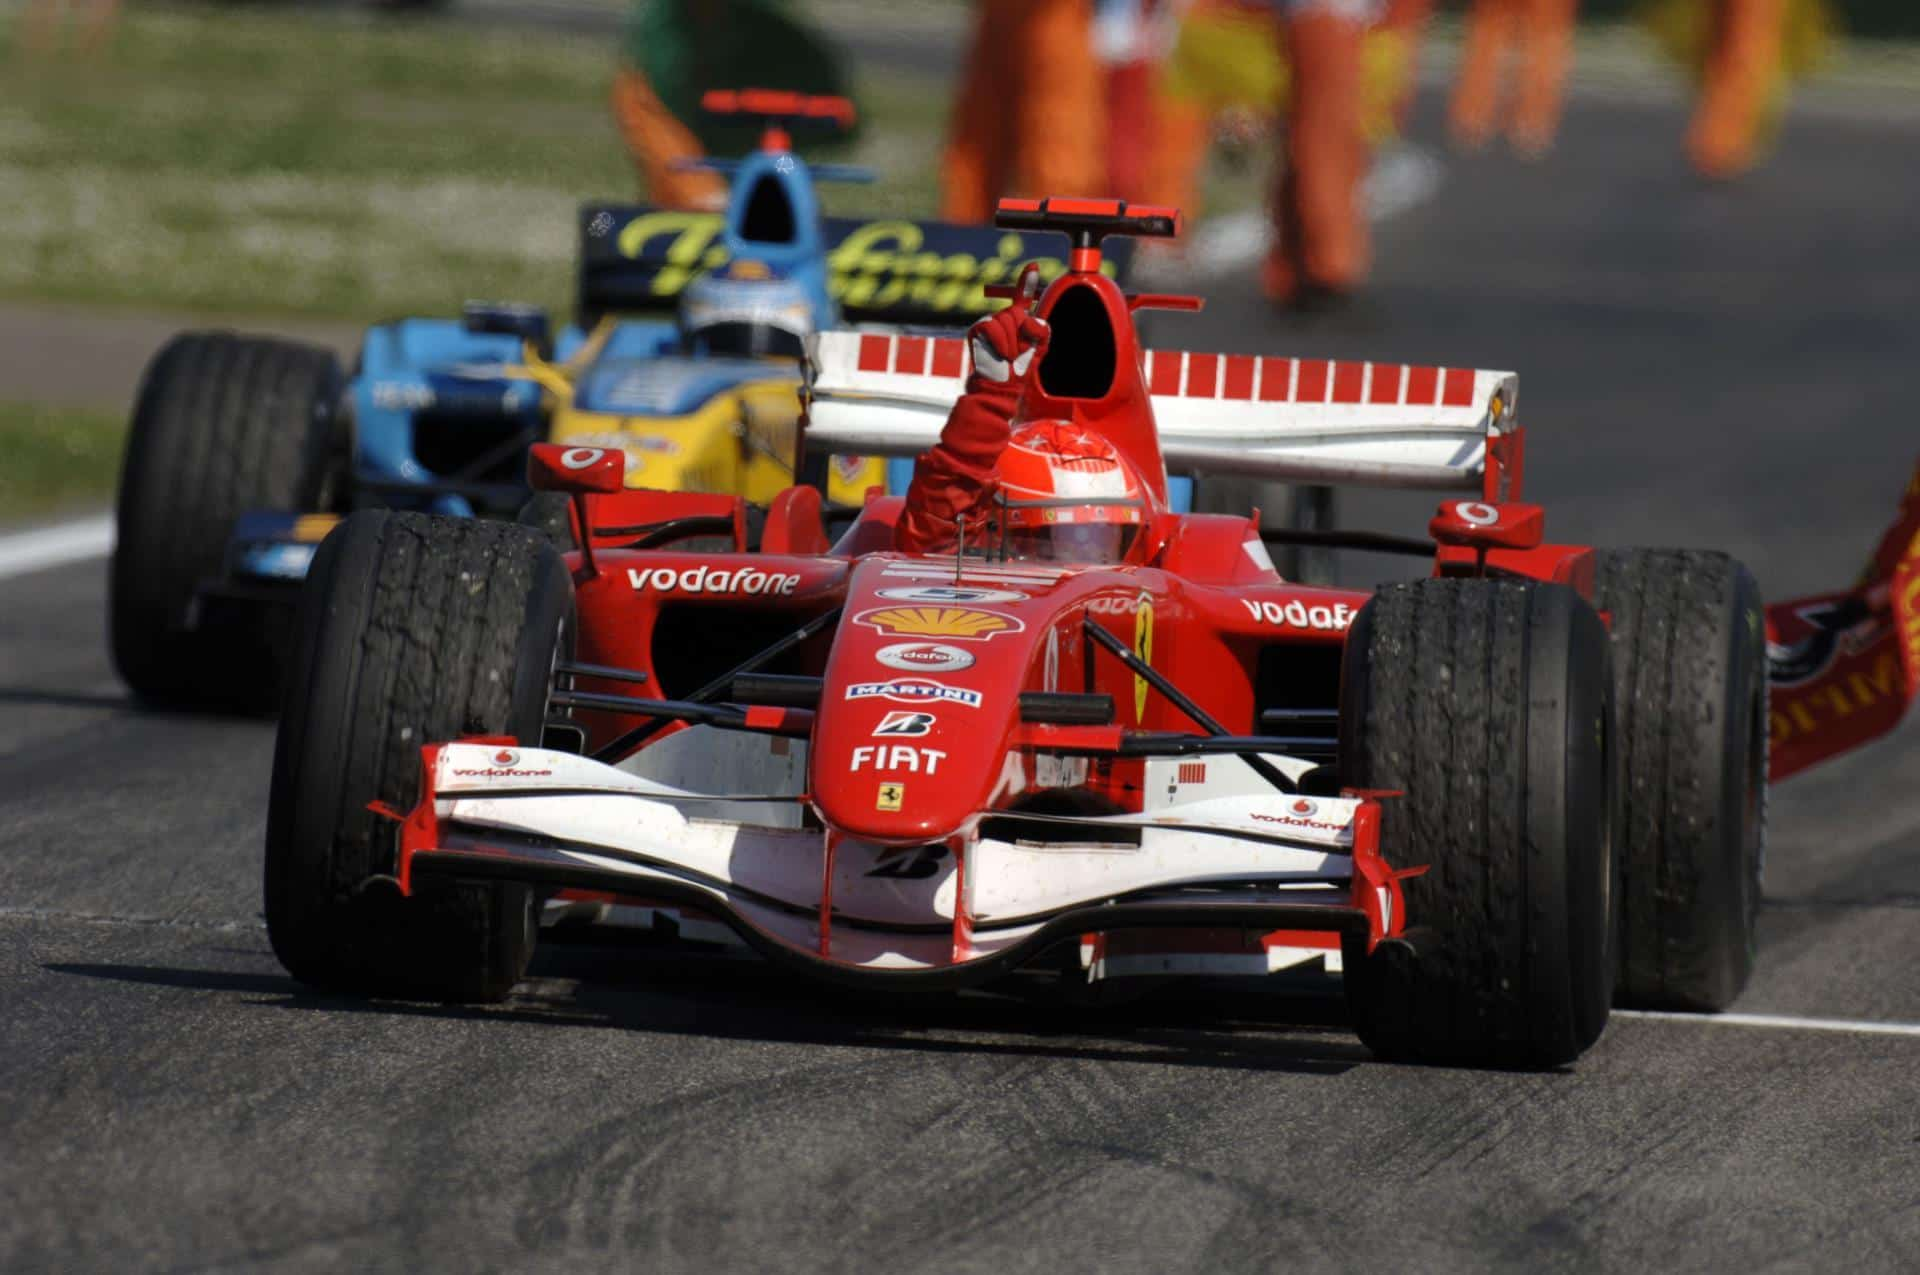 2006 San Marino GP – Schumacher beats Alonso and Senna's pole record